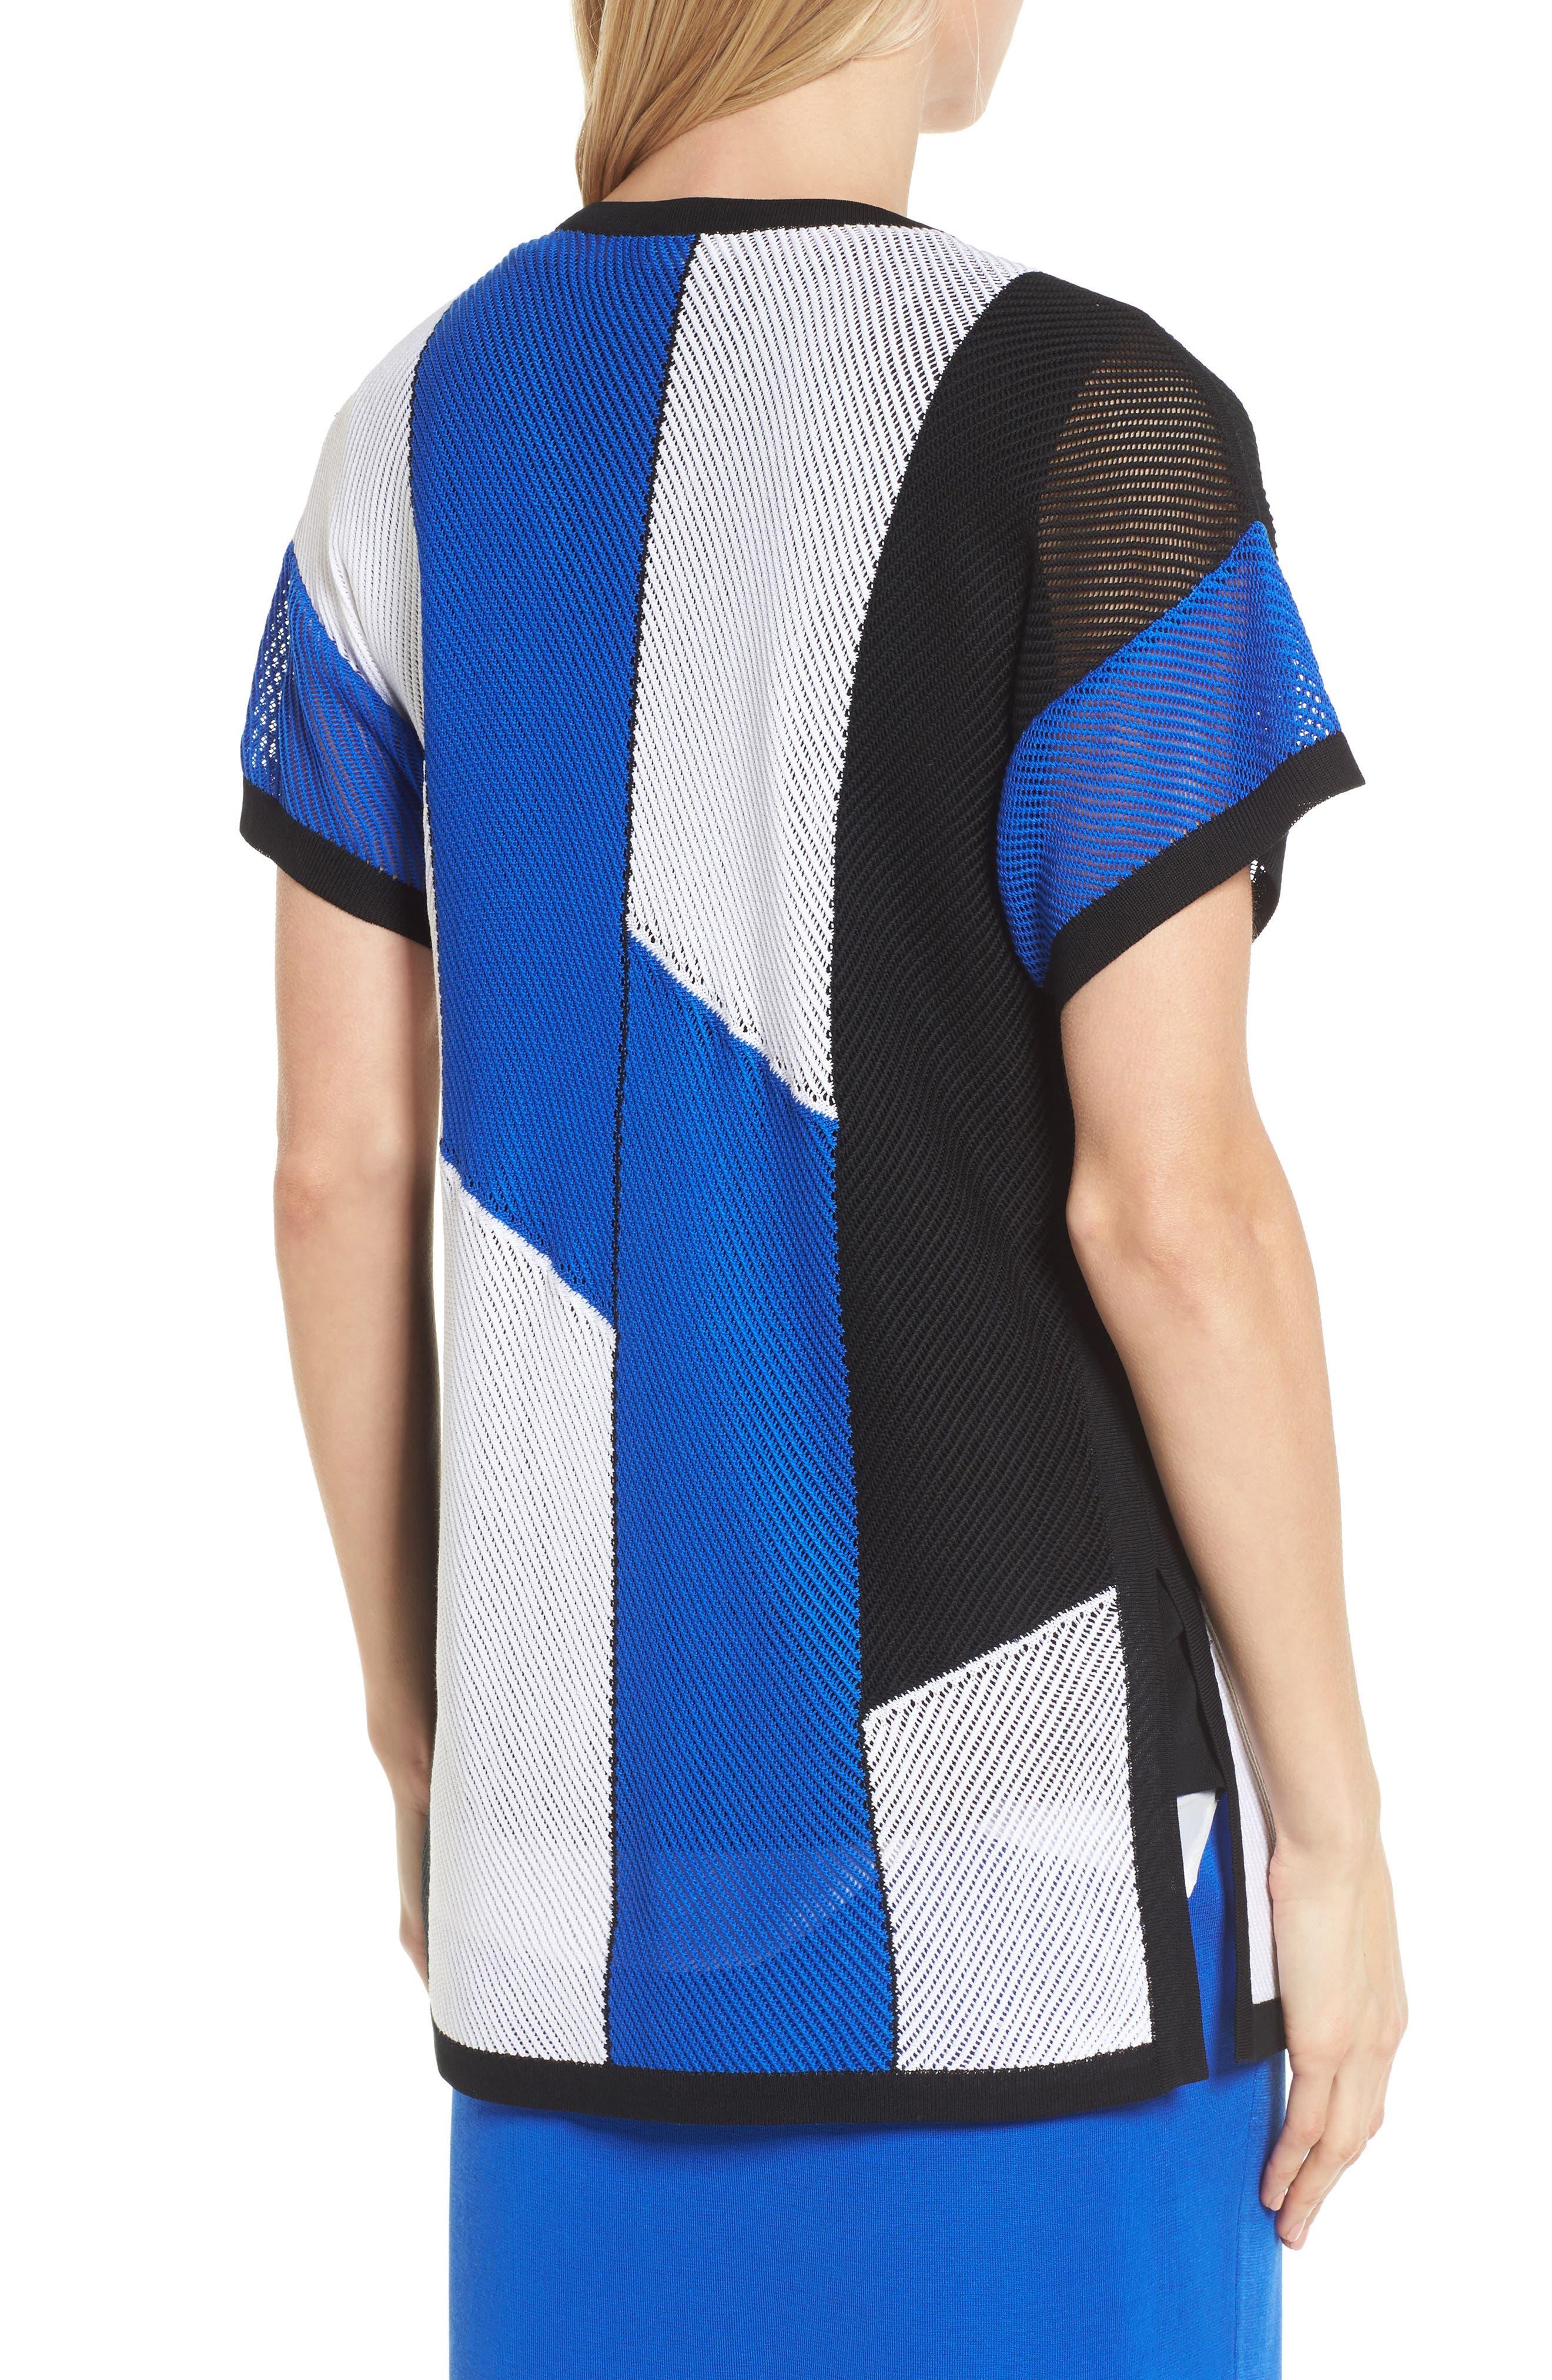 Colorblock Short Sleeve Cardigan,                             Alternate thumbnail 2, color,                             White/ Black/ Patriot Blue